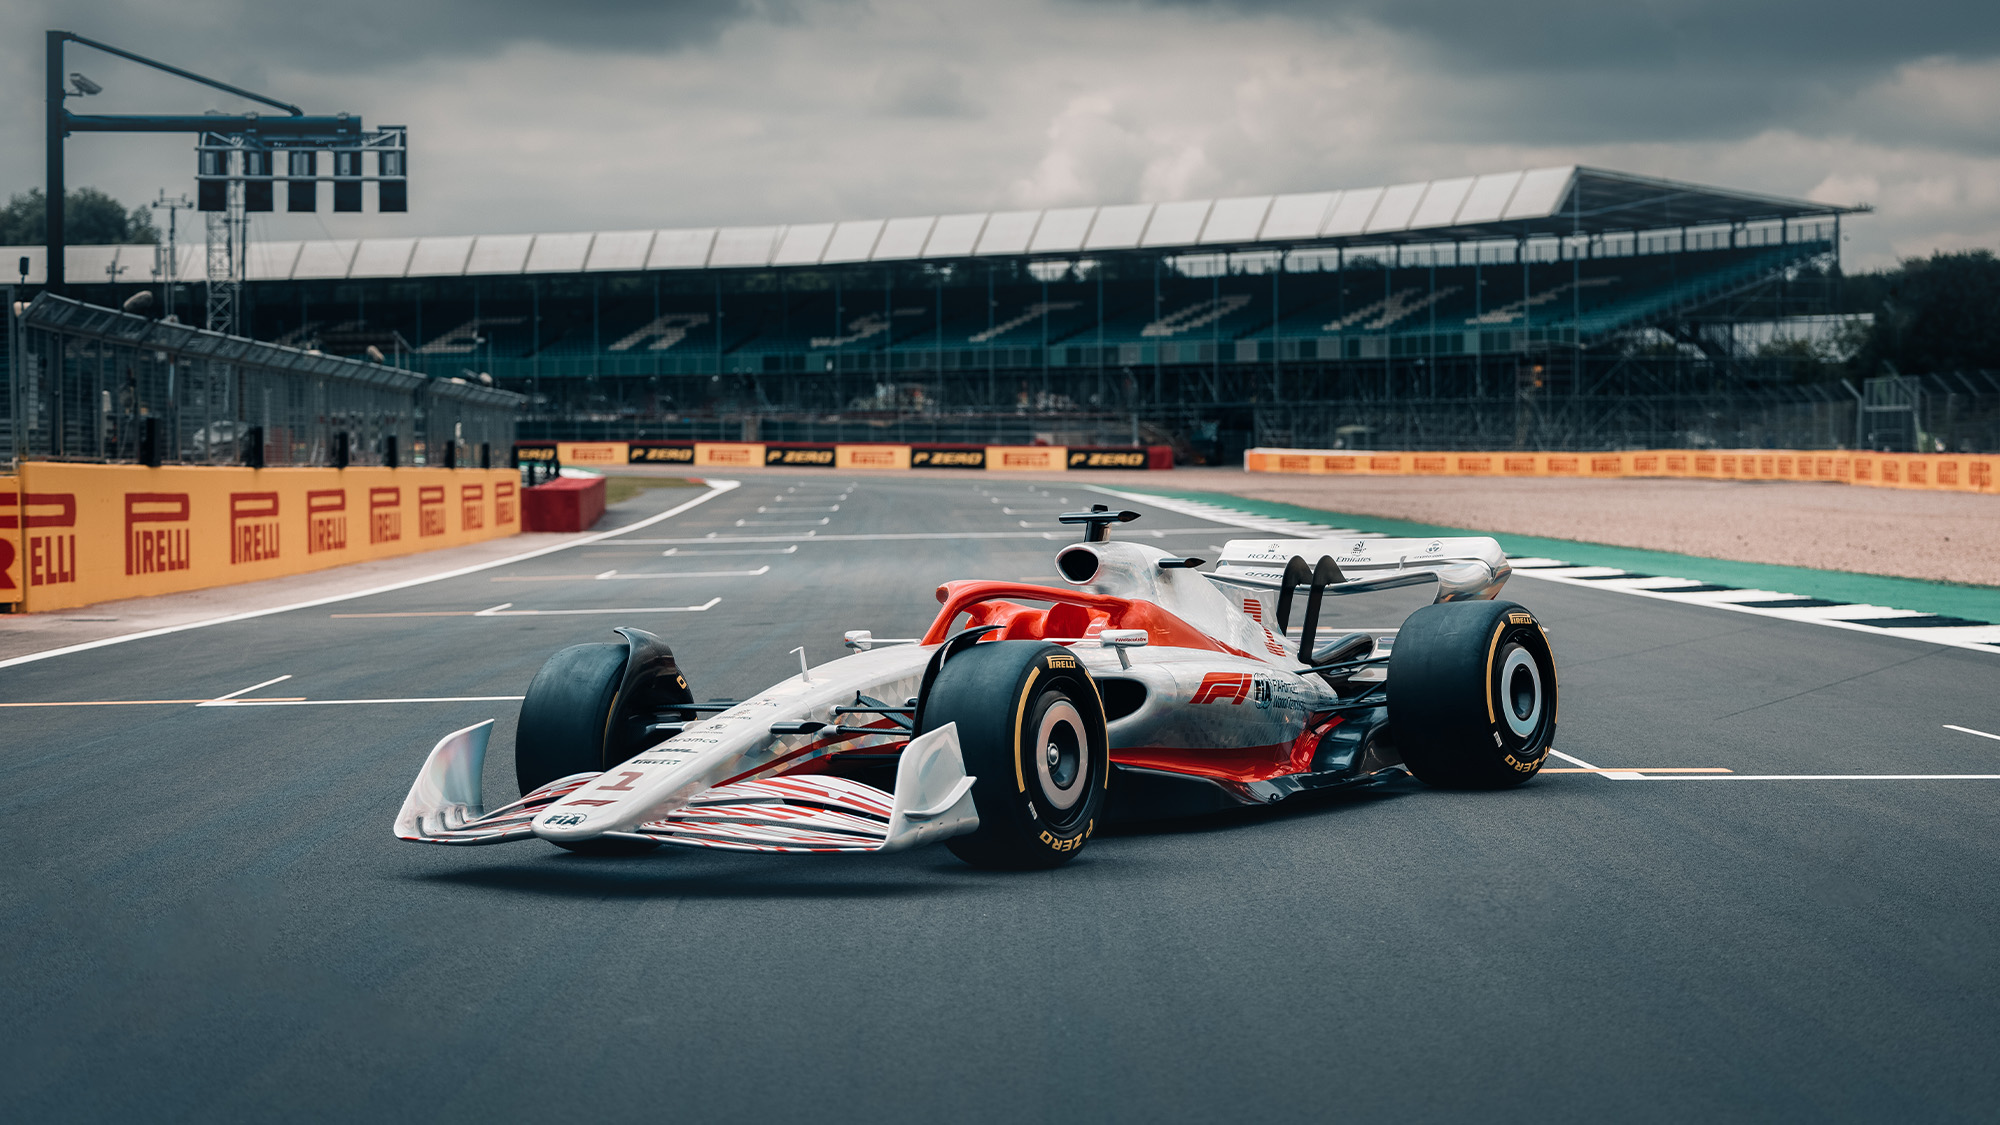 2022 F1 car model at Silverstone